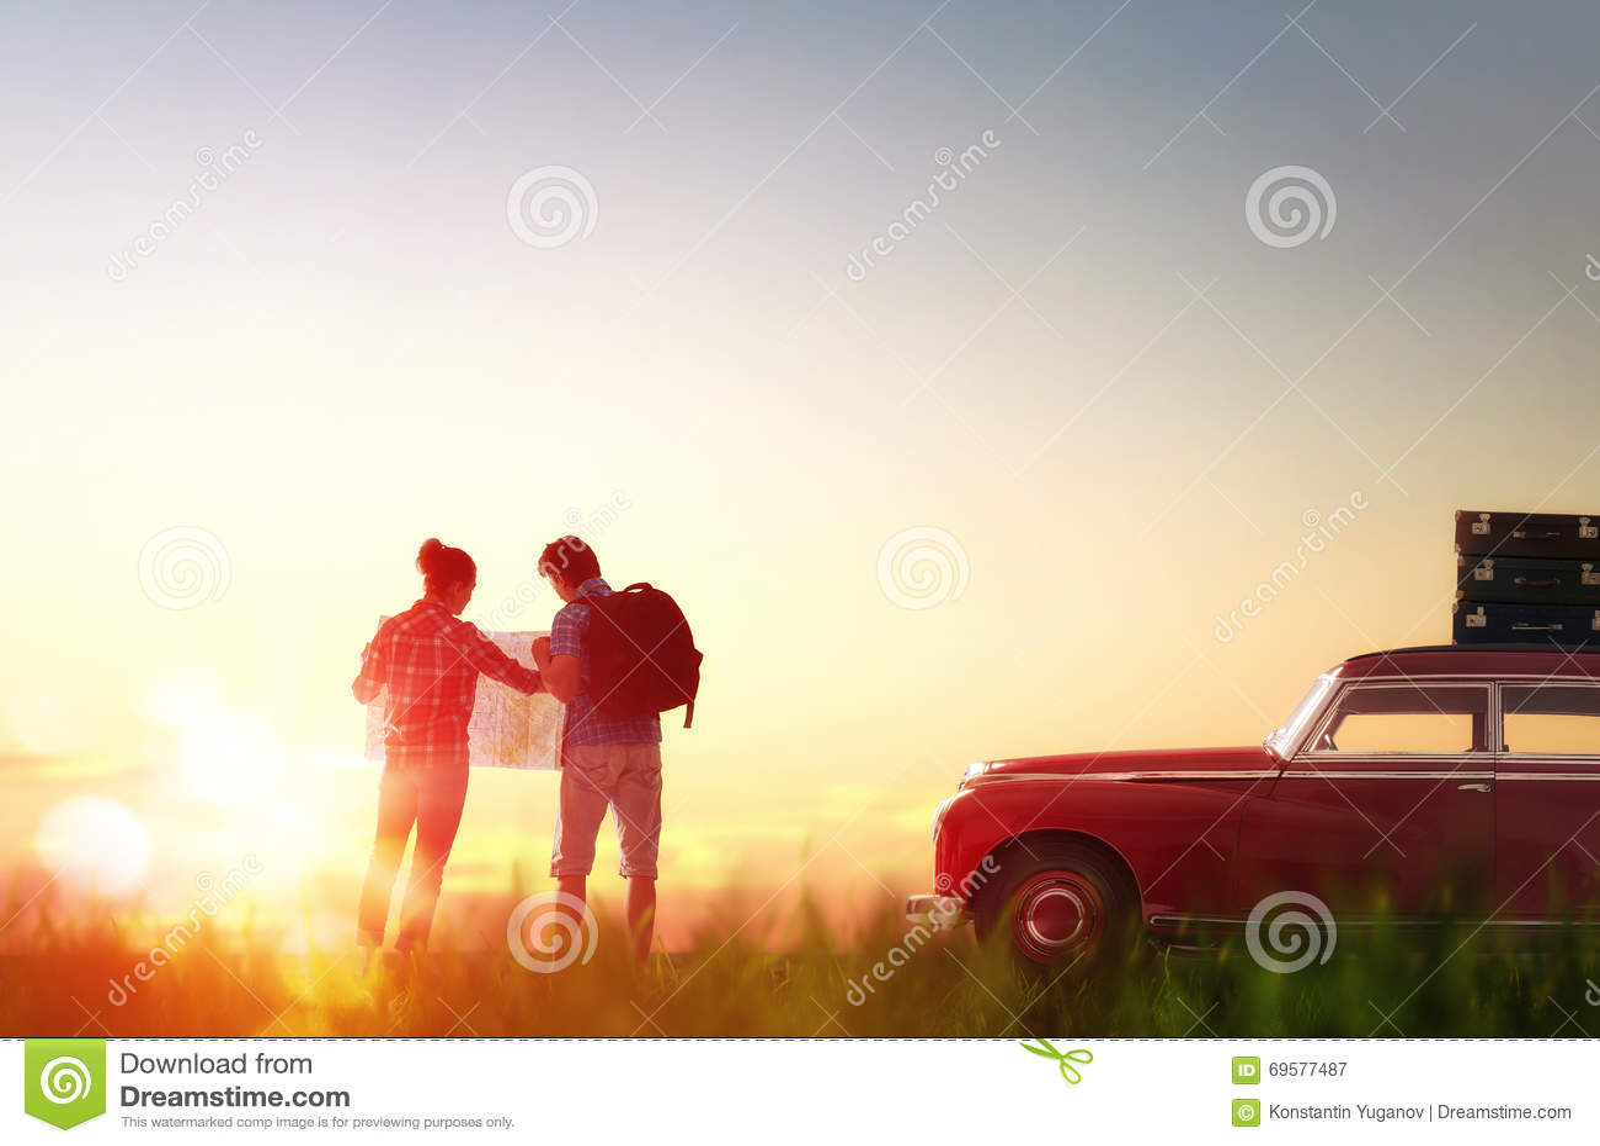 enjoying road trip stock image image of beautiful summer. Black Bedroom Furniture Sets. Home Design Ideas